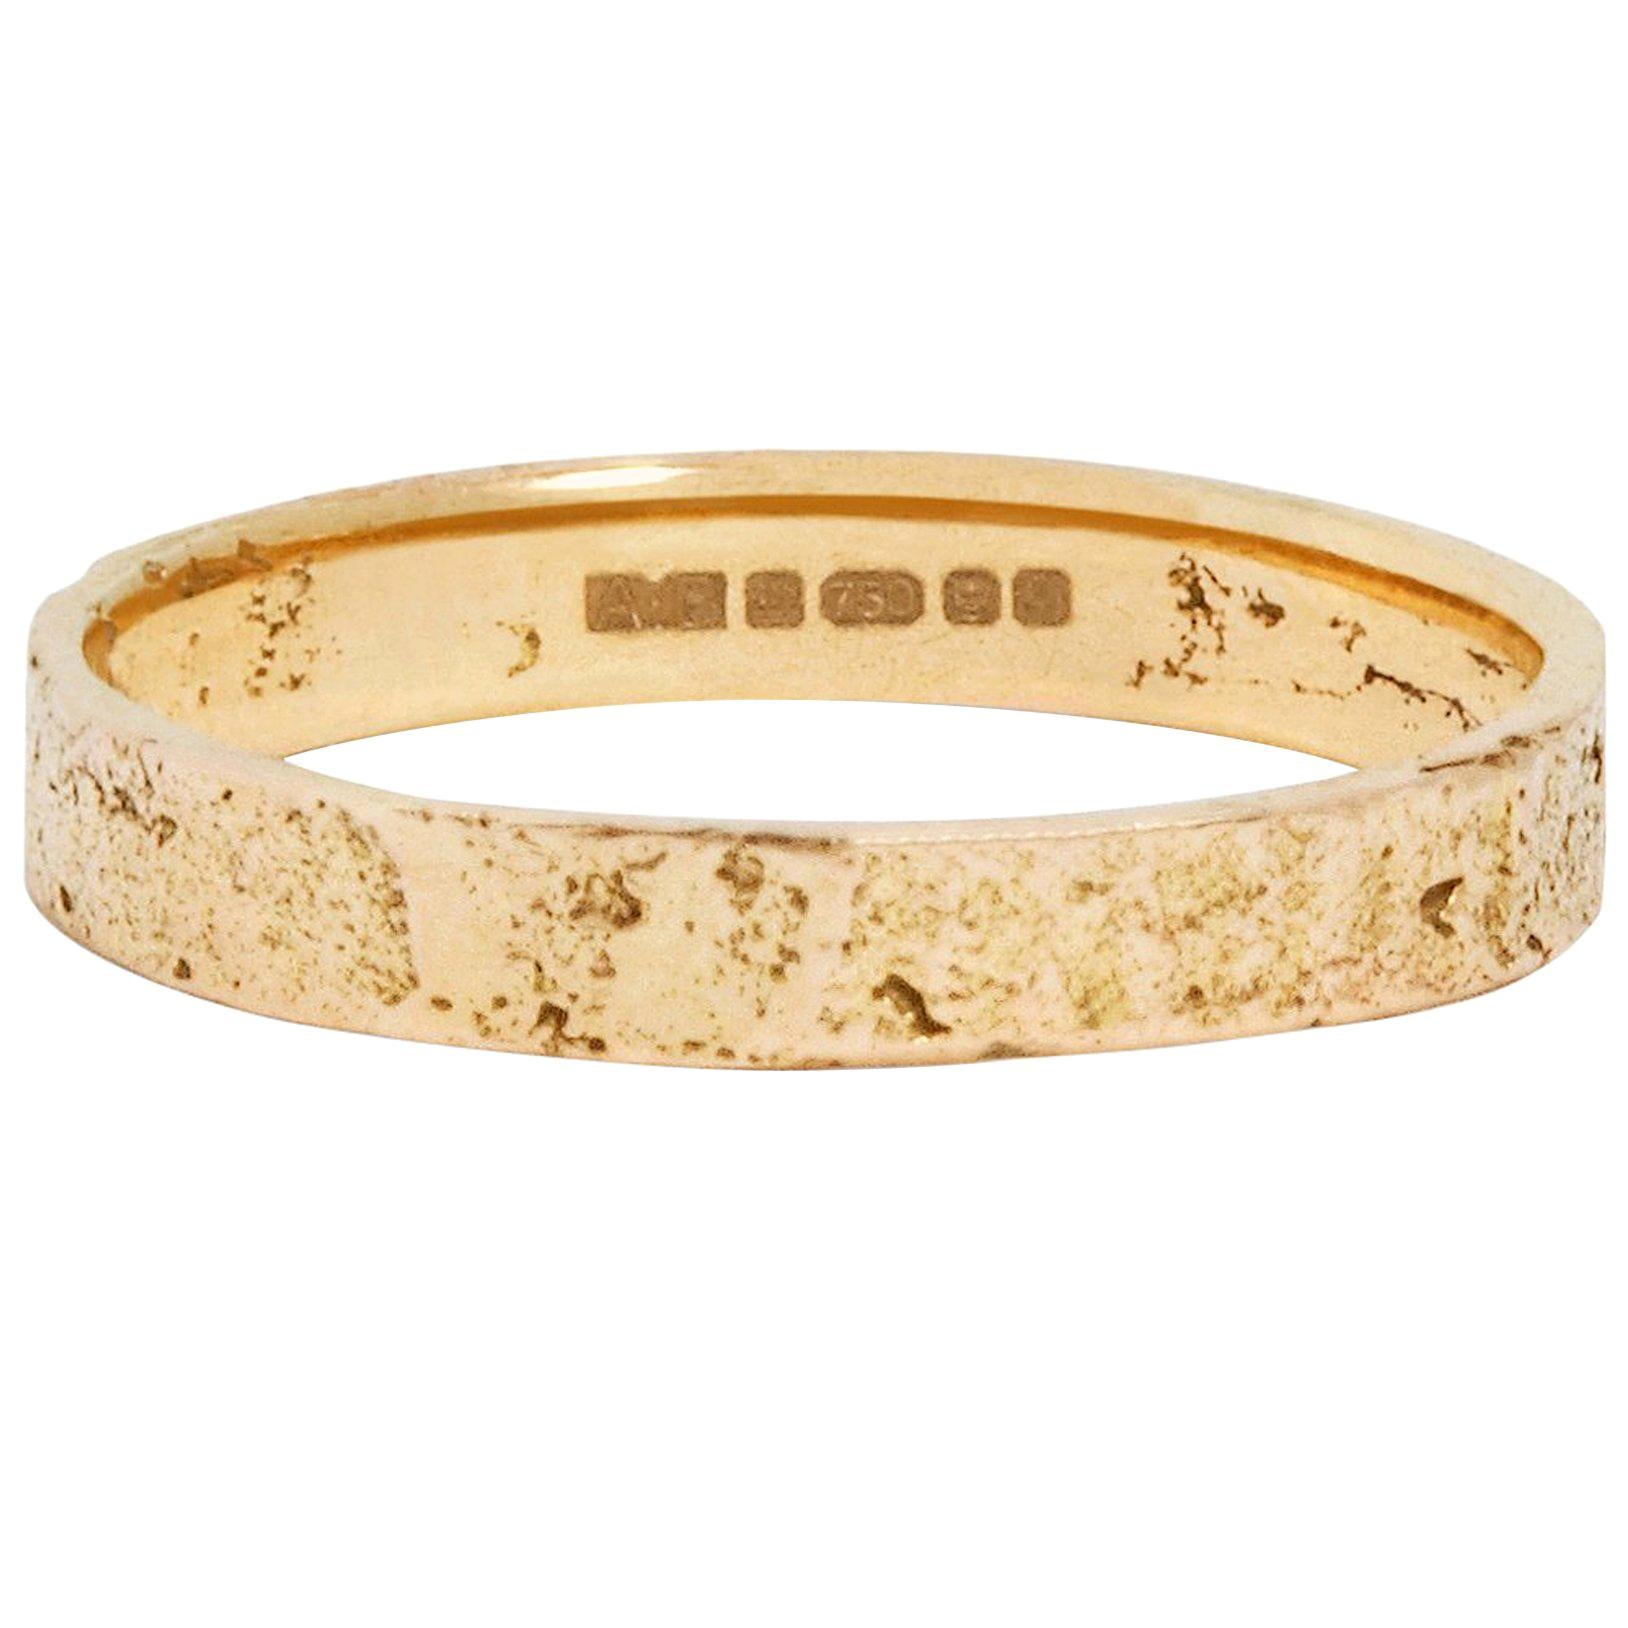 Paper Ring in 9 Karat Gold by Allison Bryan